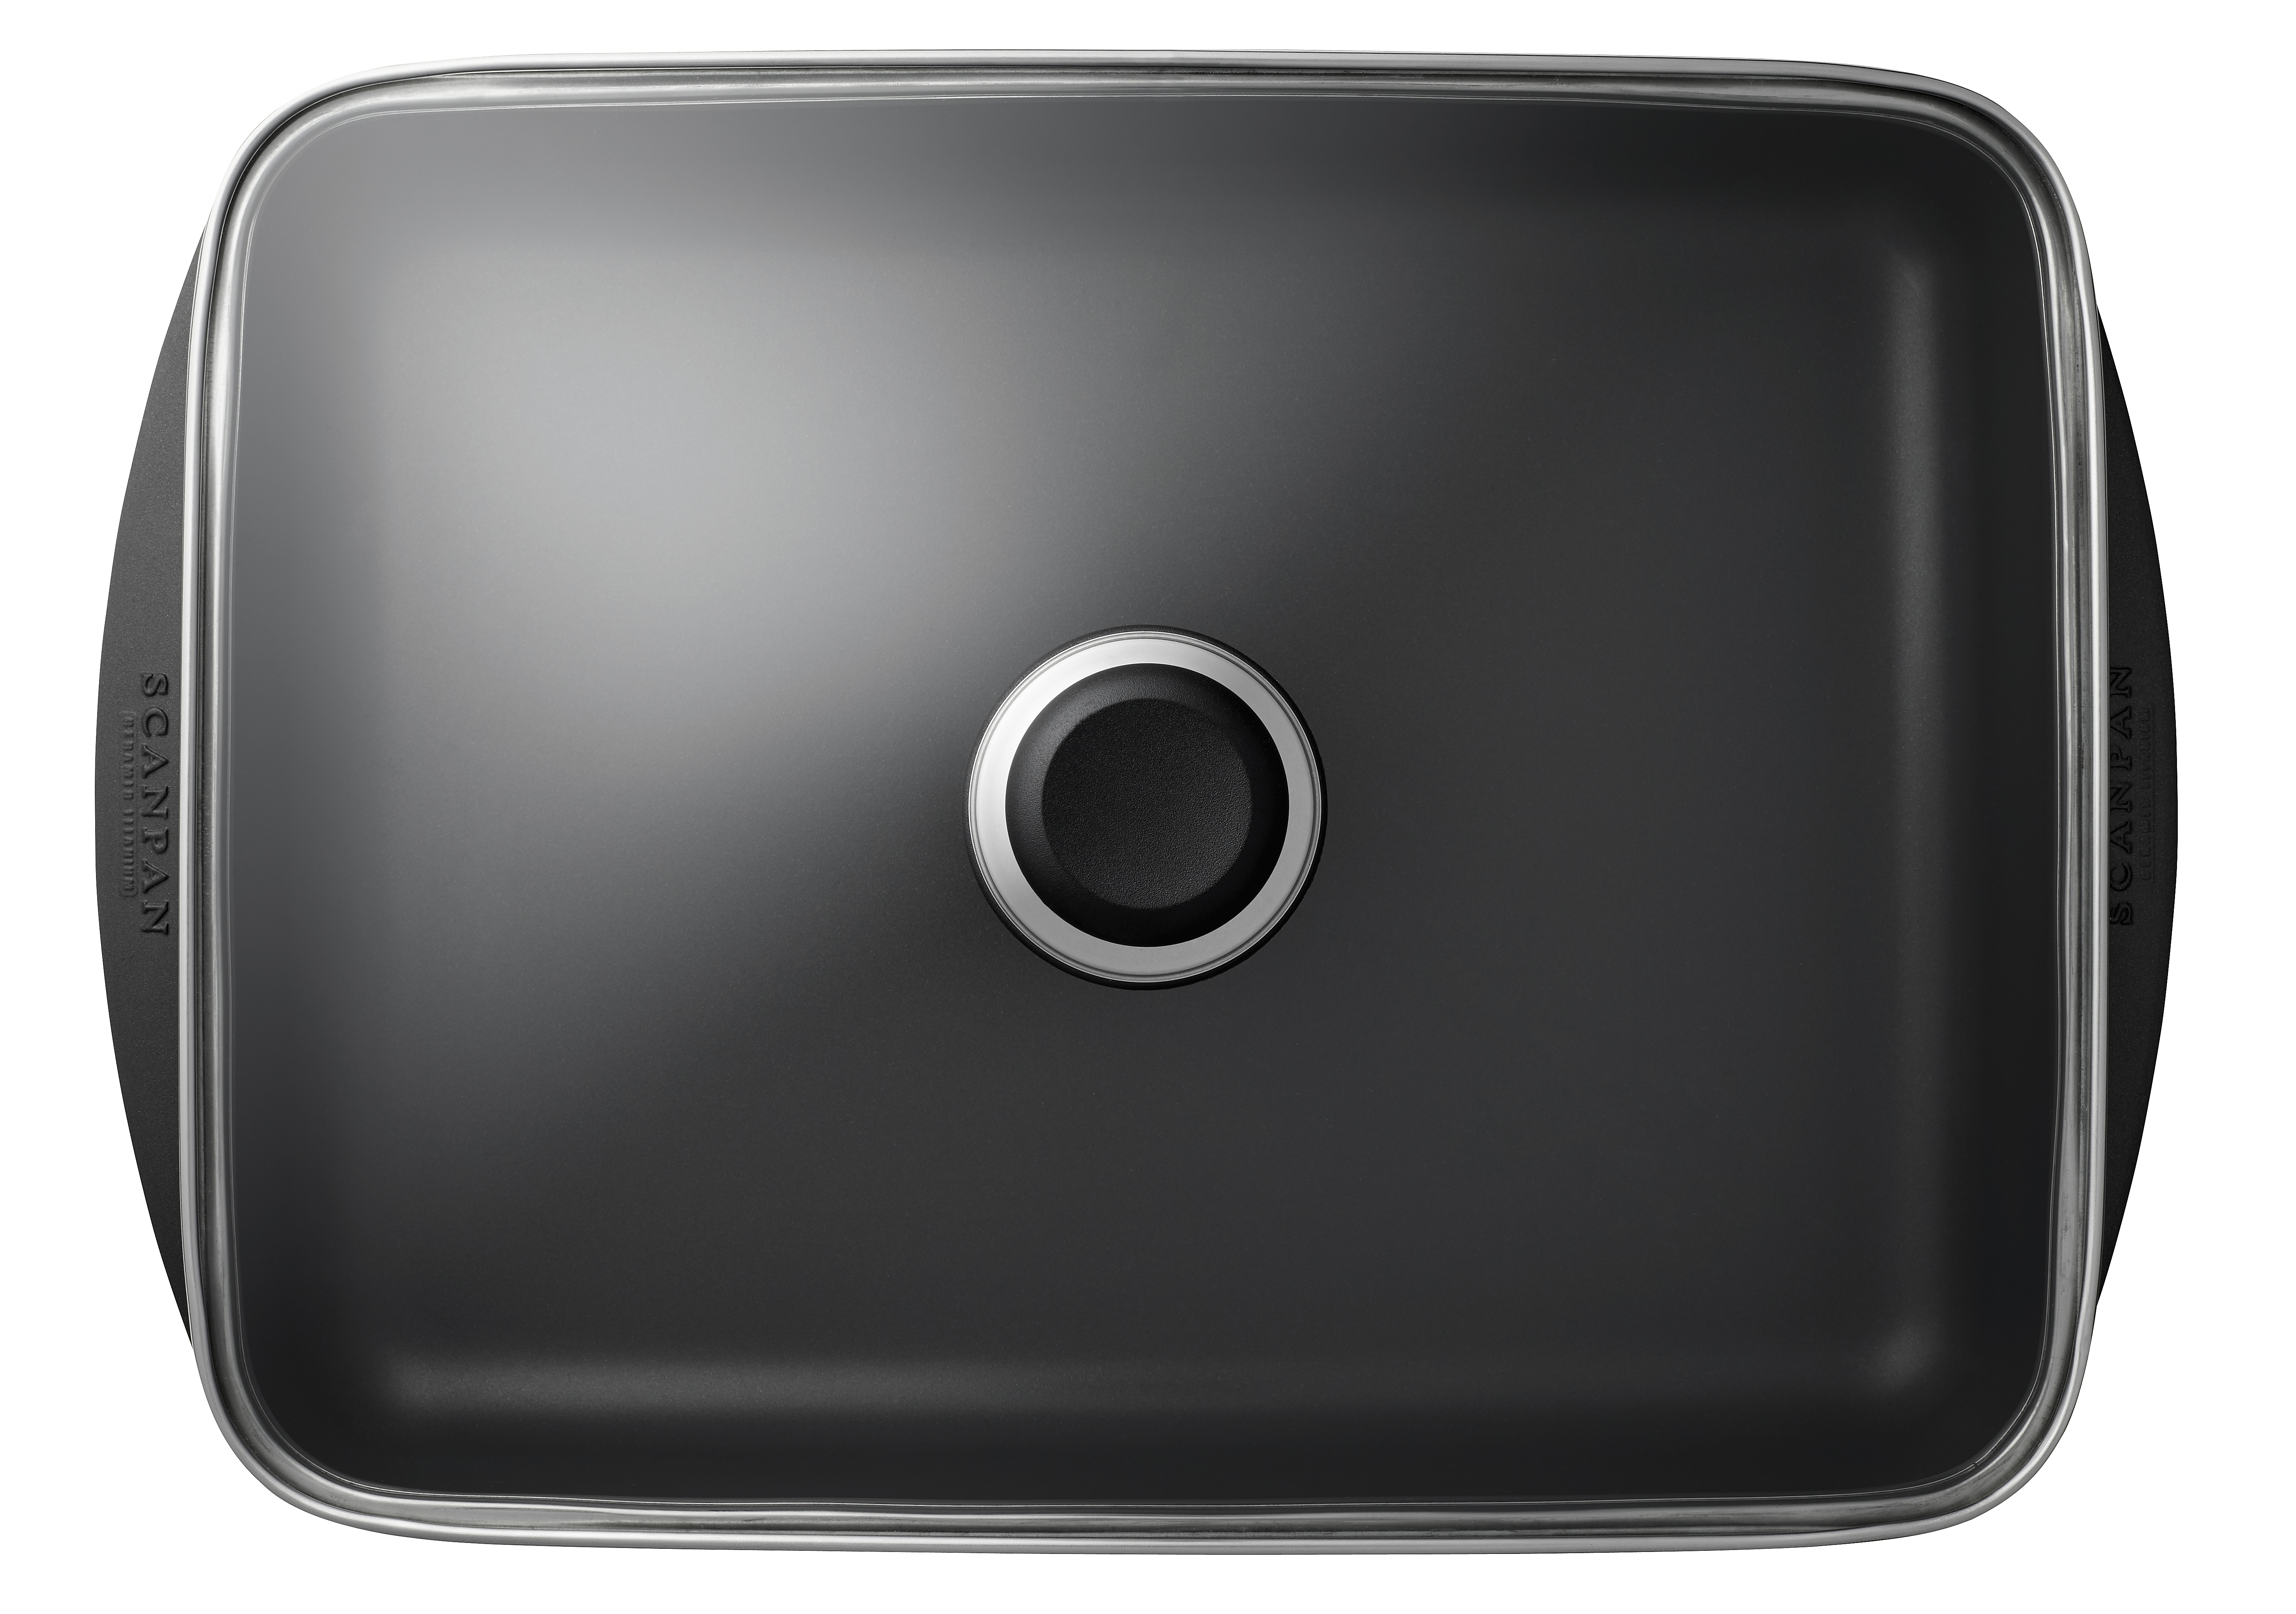 35.5x26.5cmGlassLidin sleeve, for 35321200,